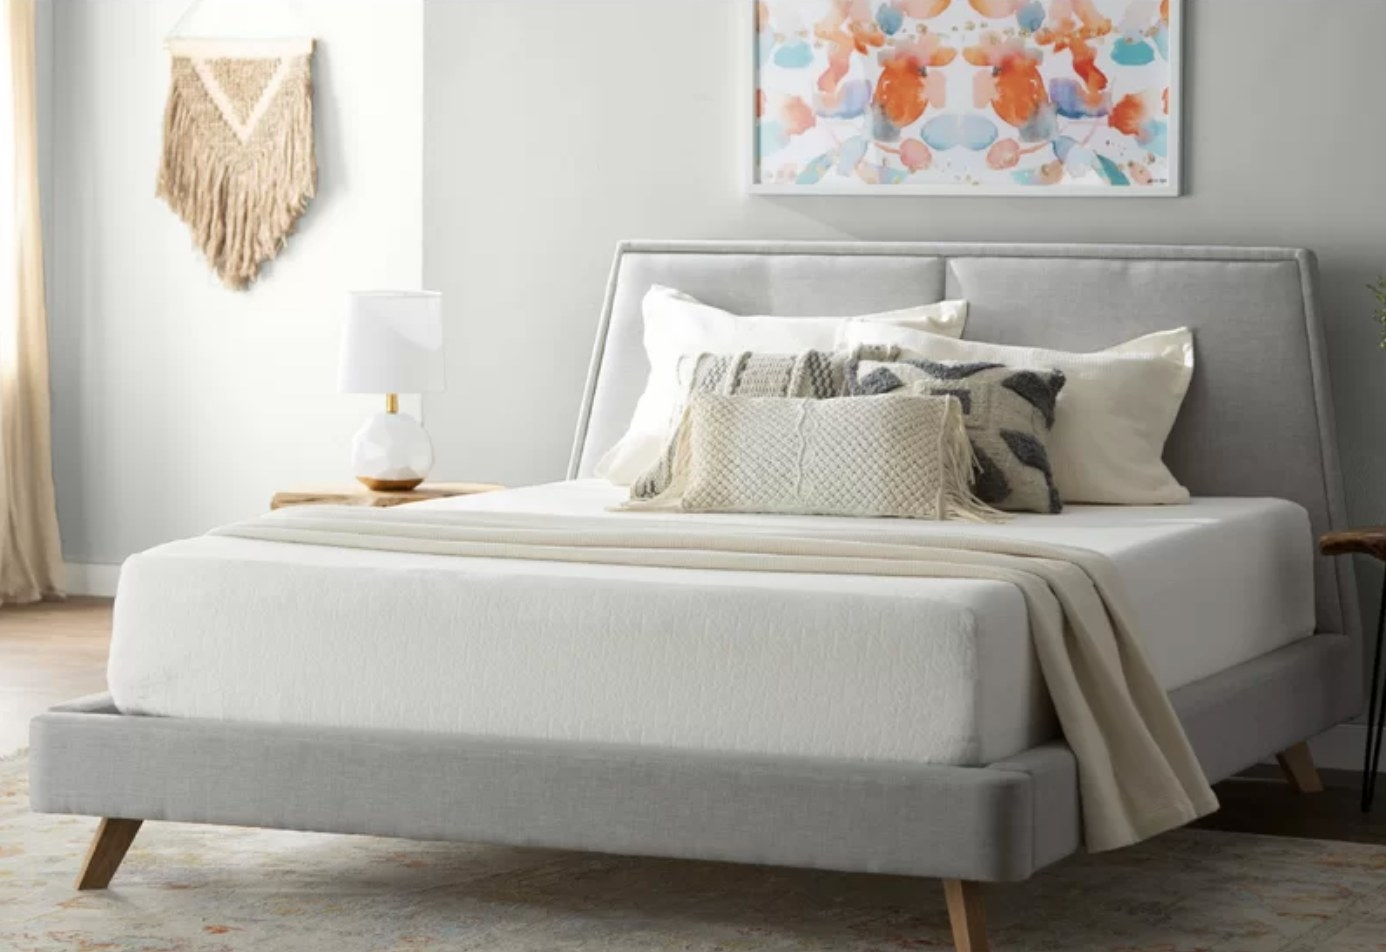 The 10 inch medium memory foam mattress